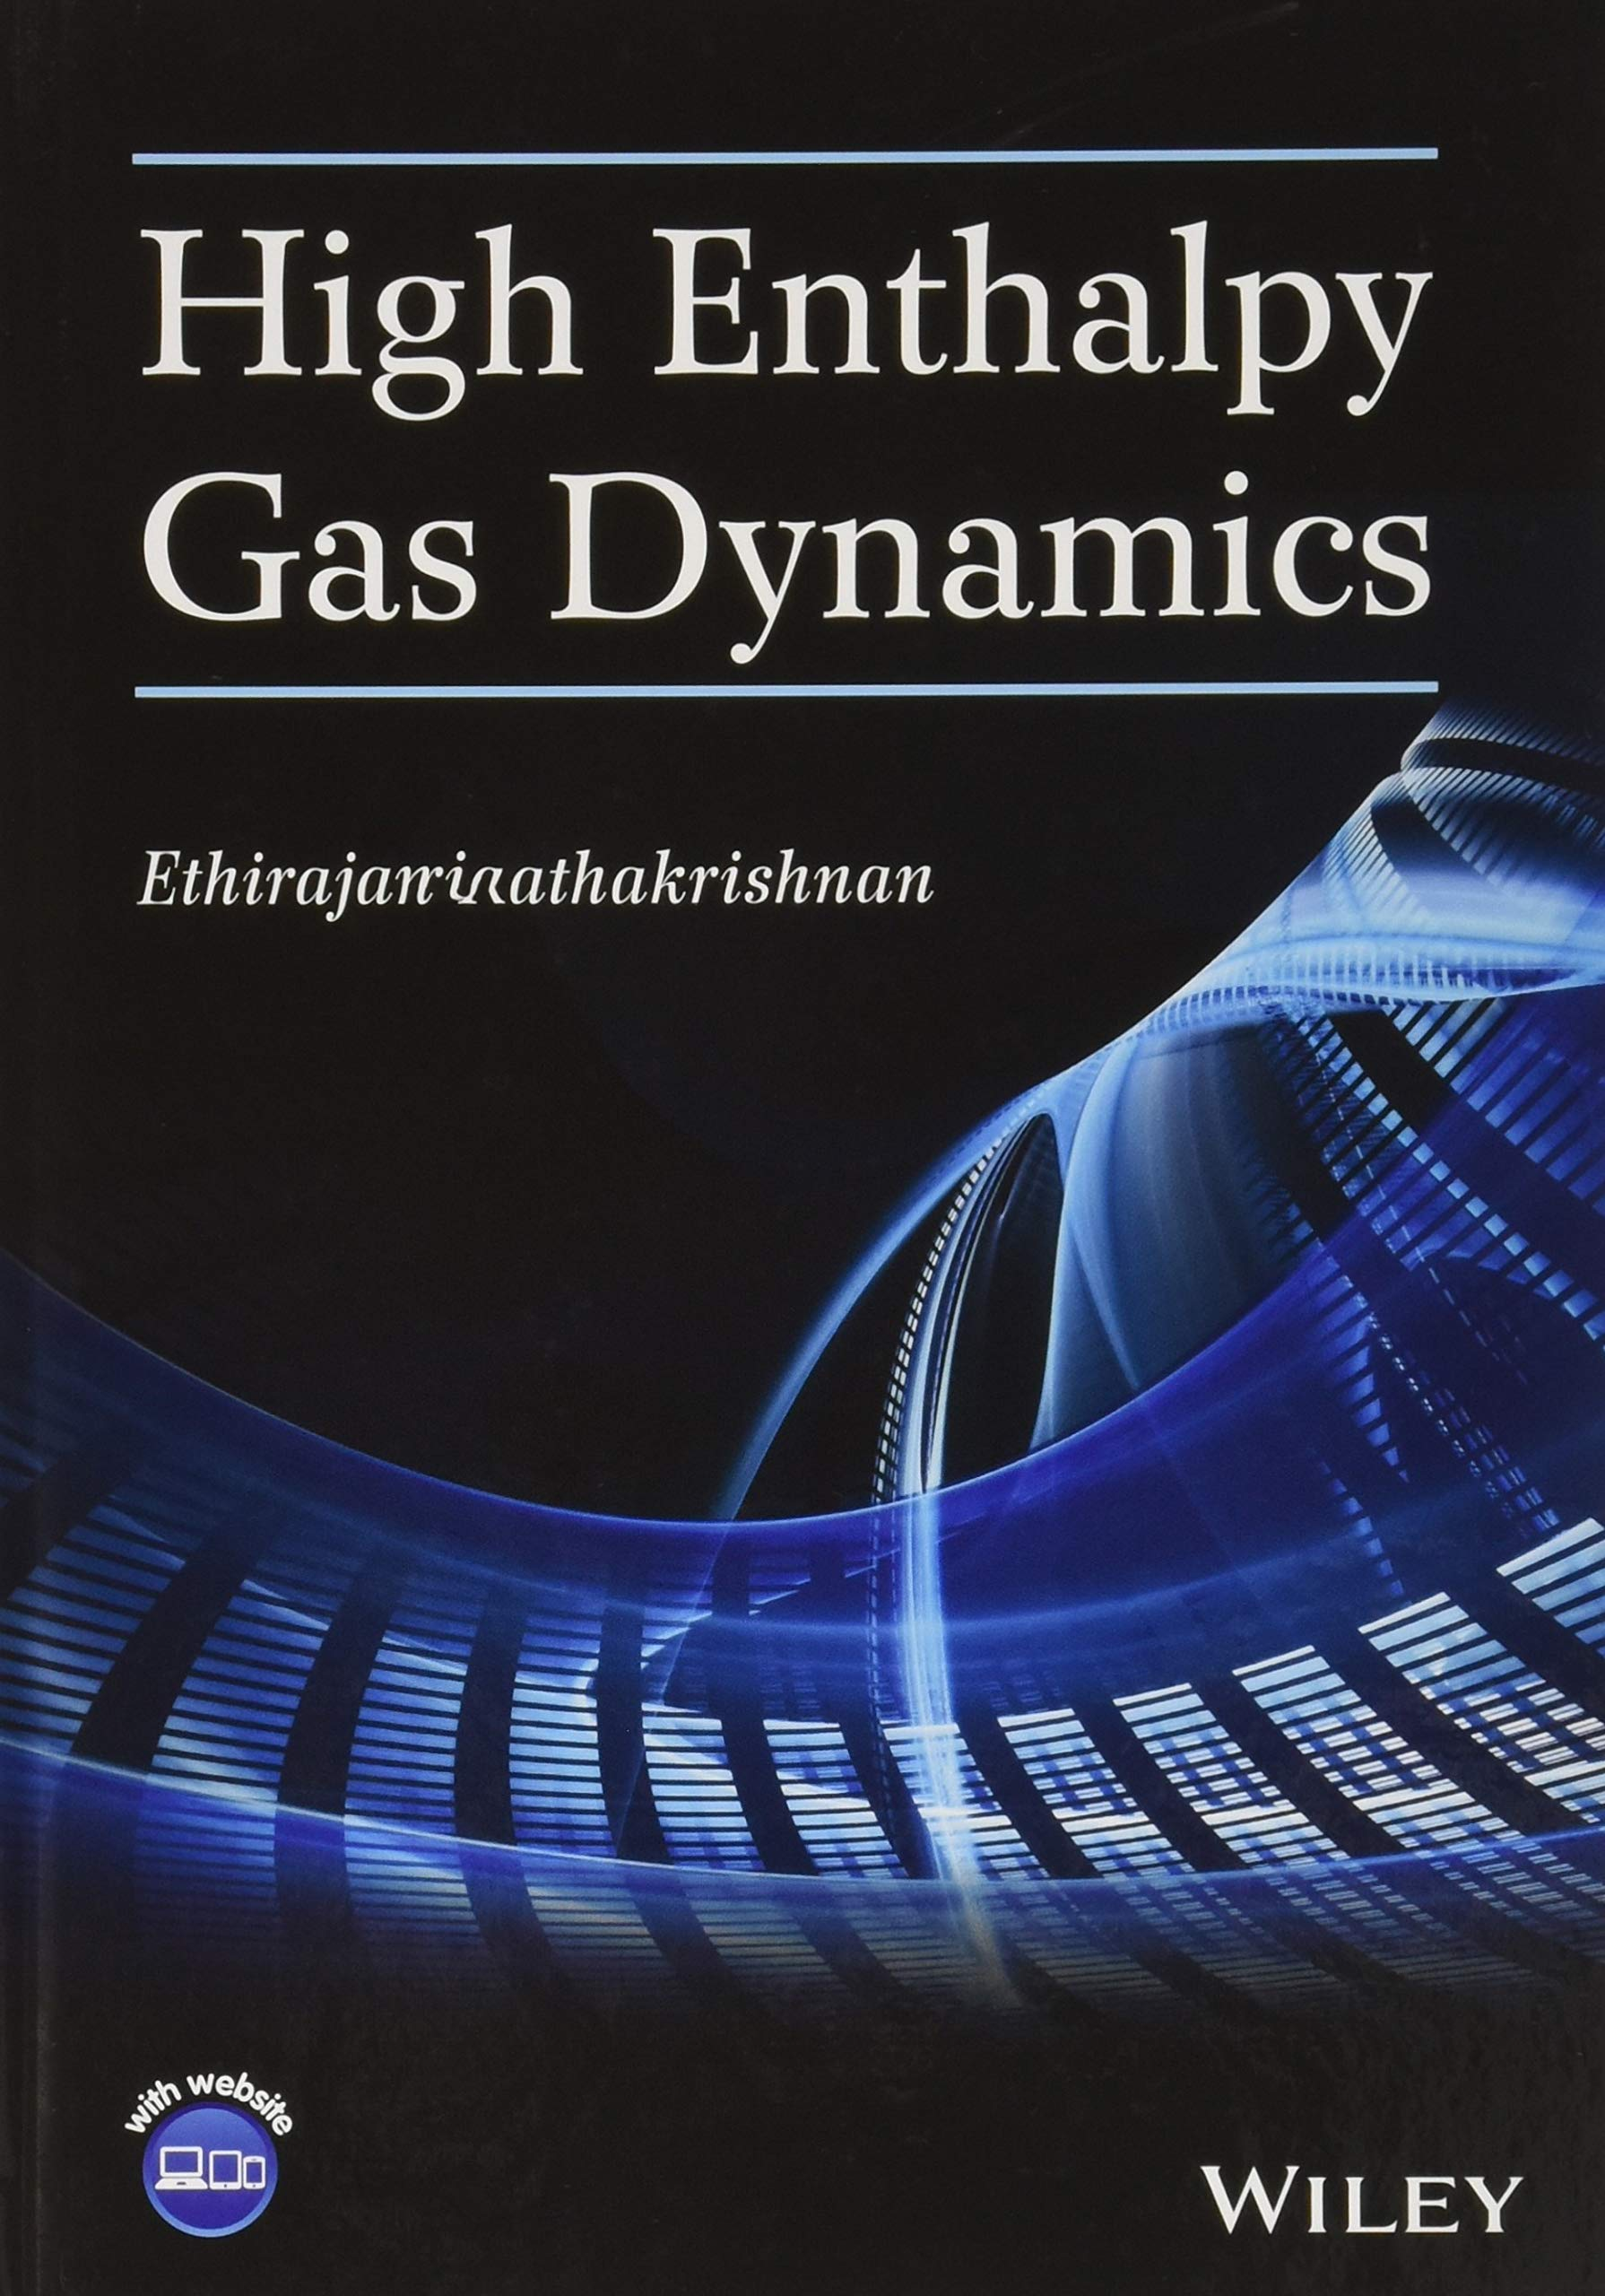 gas dynamics by rathakrishnan numerical solutions